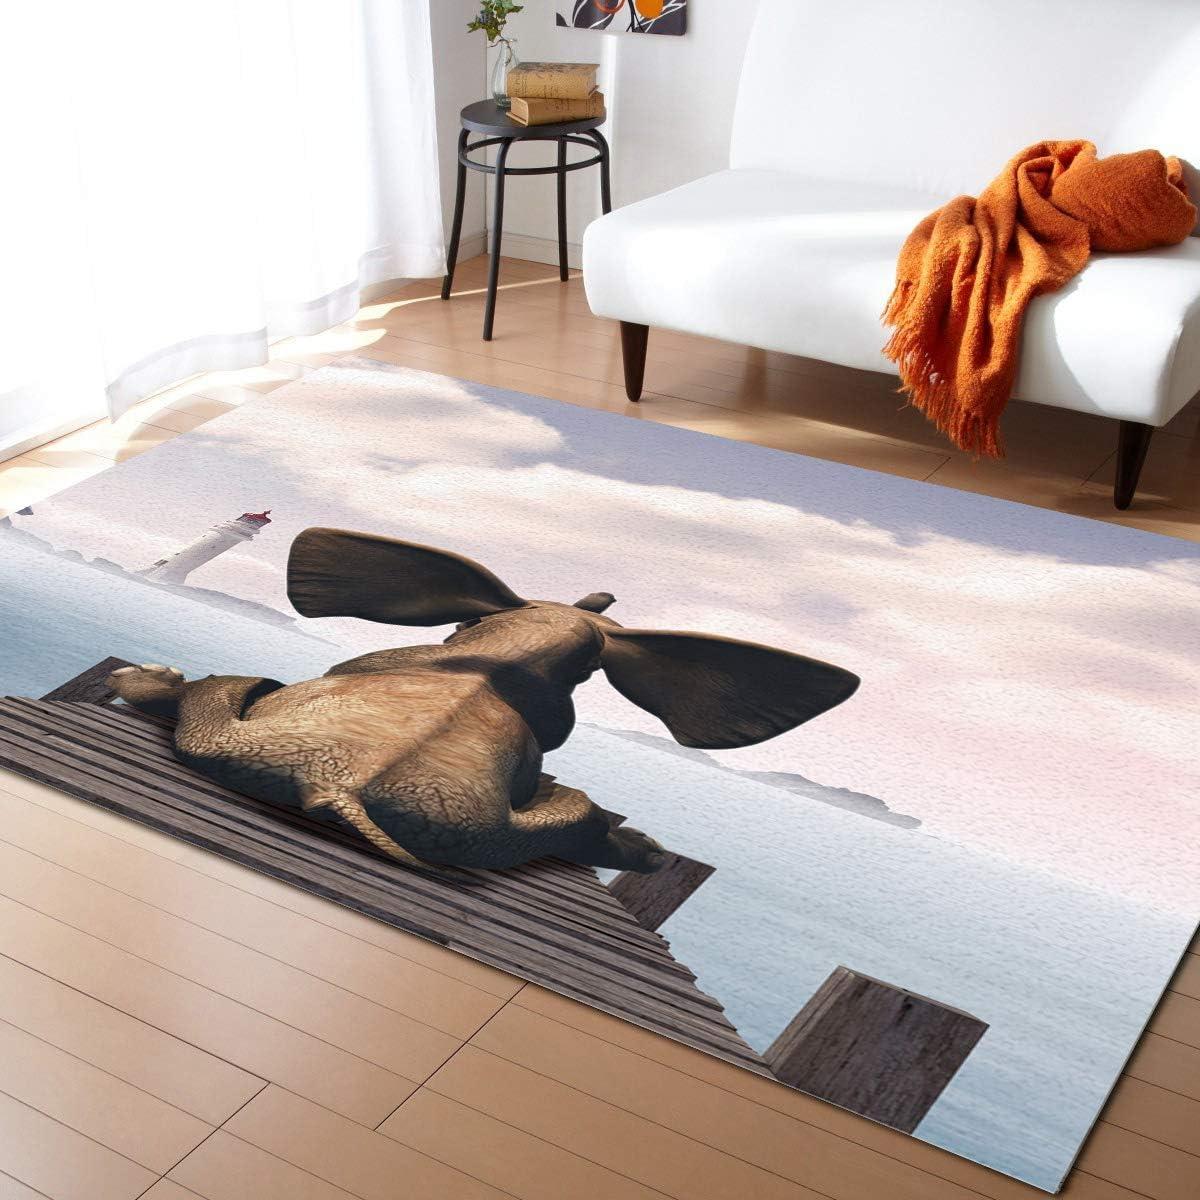 ARTSHOWING Funny Animal Luxury goods Large Area Rug 3' x Durable 2' O Indoor OFFer